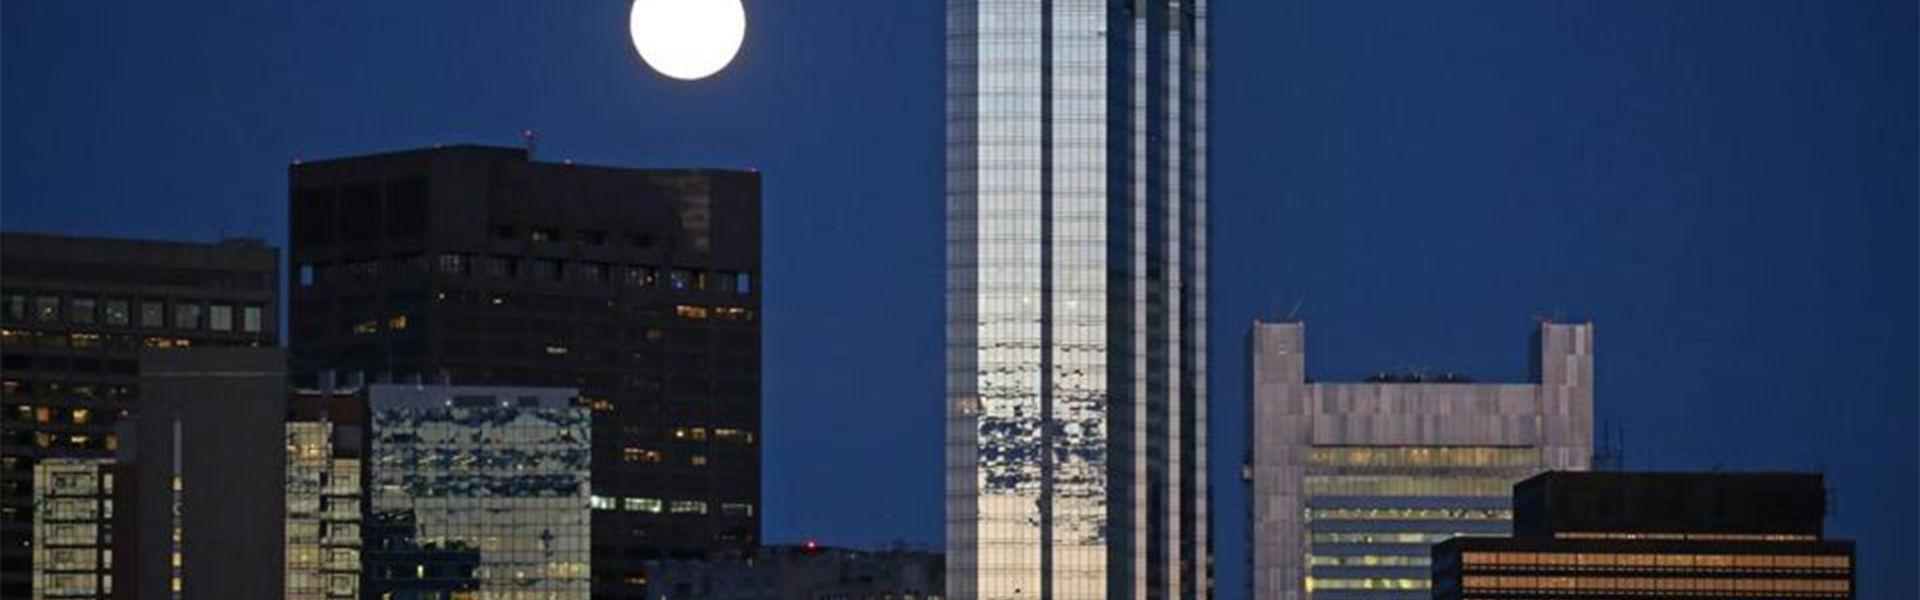 Condo sales hit lofty heights last year in Boston